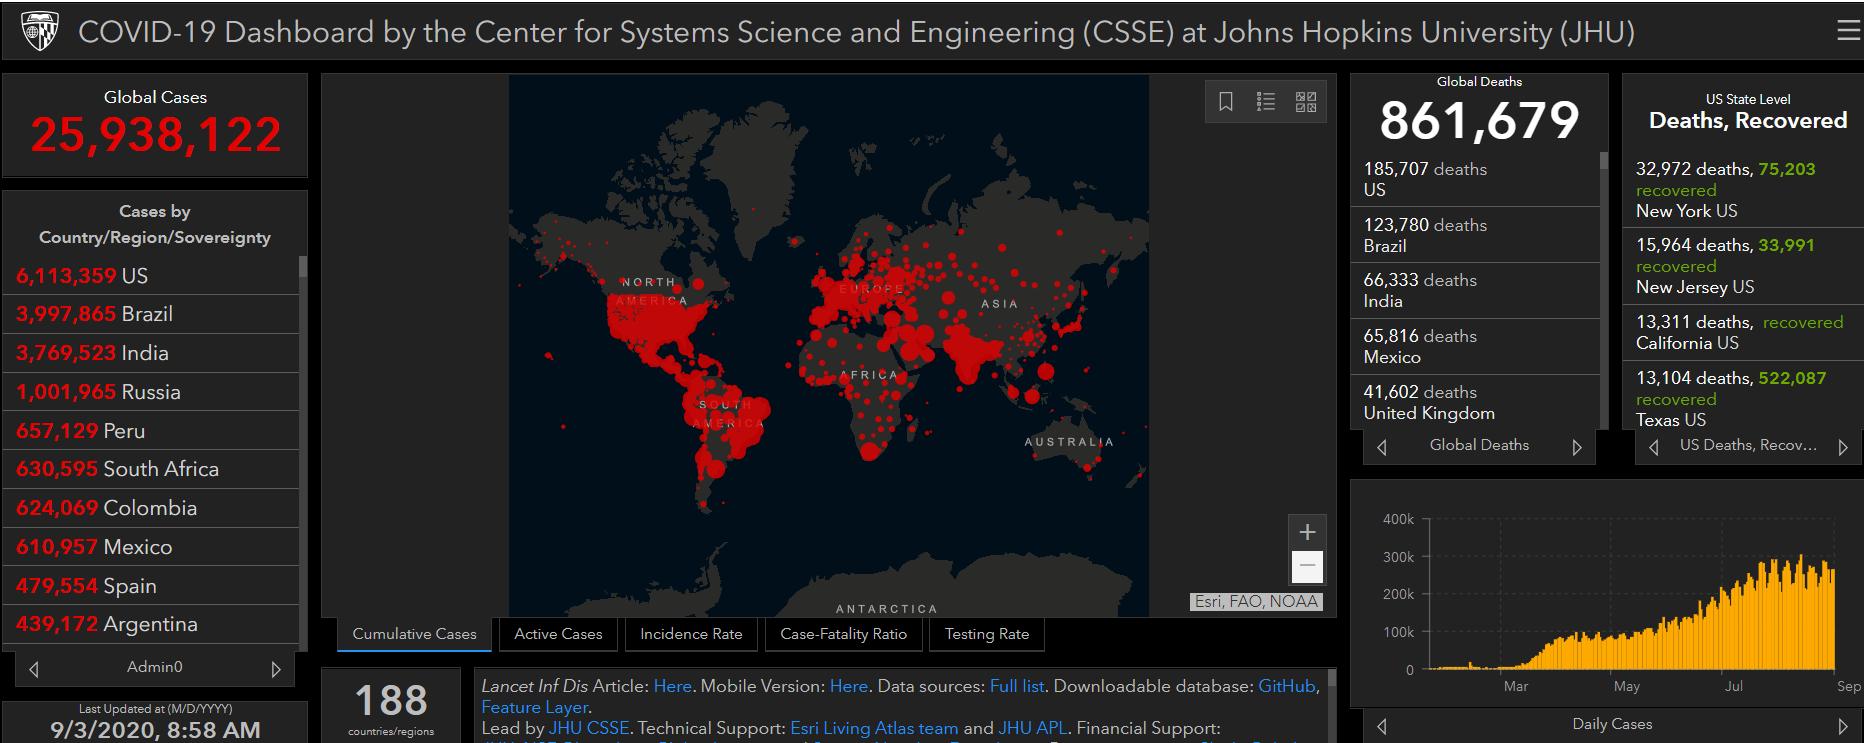 COVID-19 Dashboard by CSSE at JHU - Week 36 Update.jpg